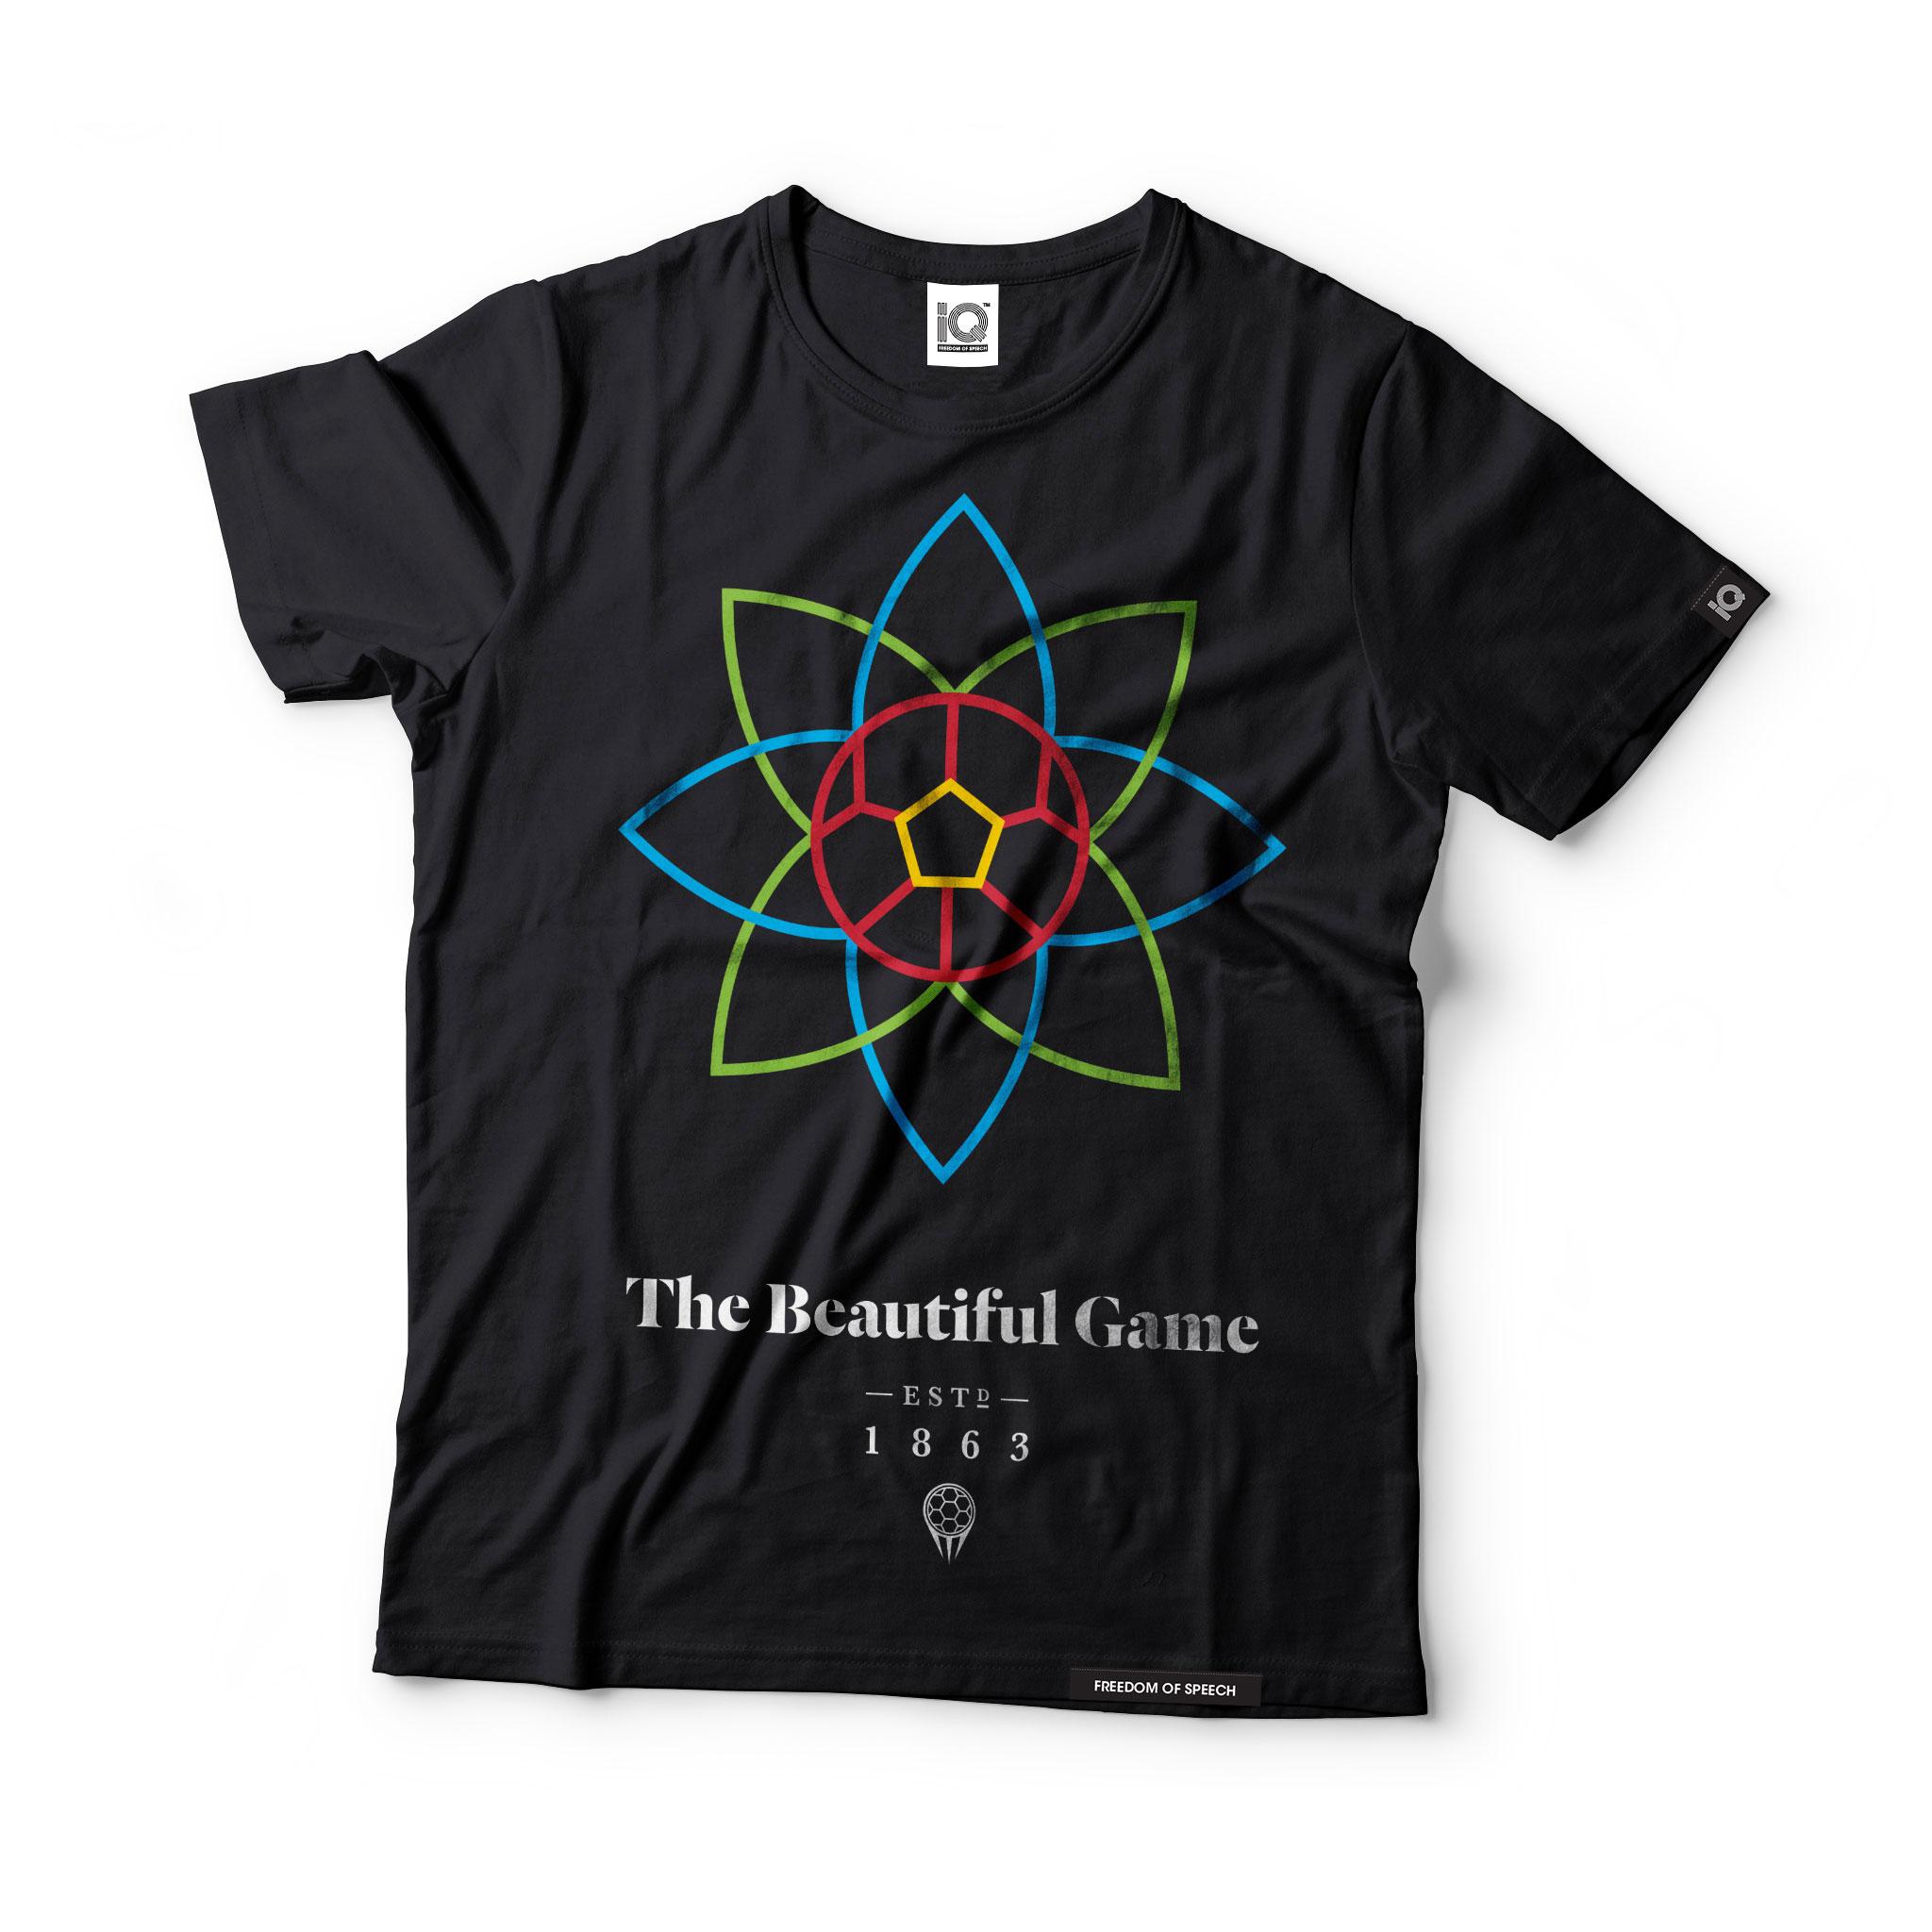 the-beautiful-game-black-tshirt